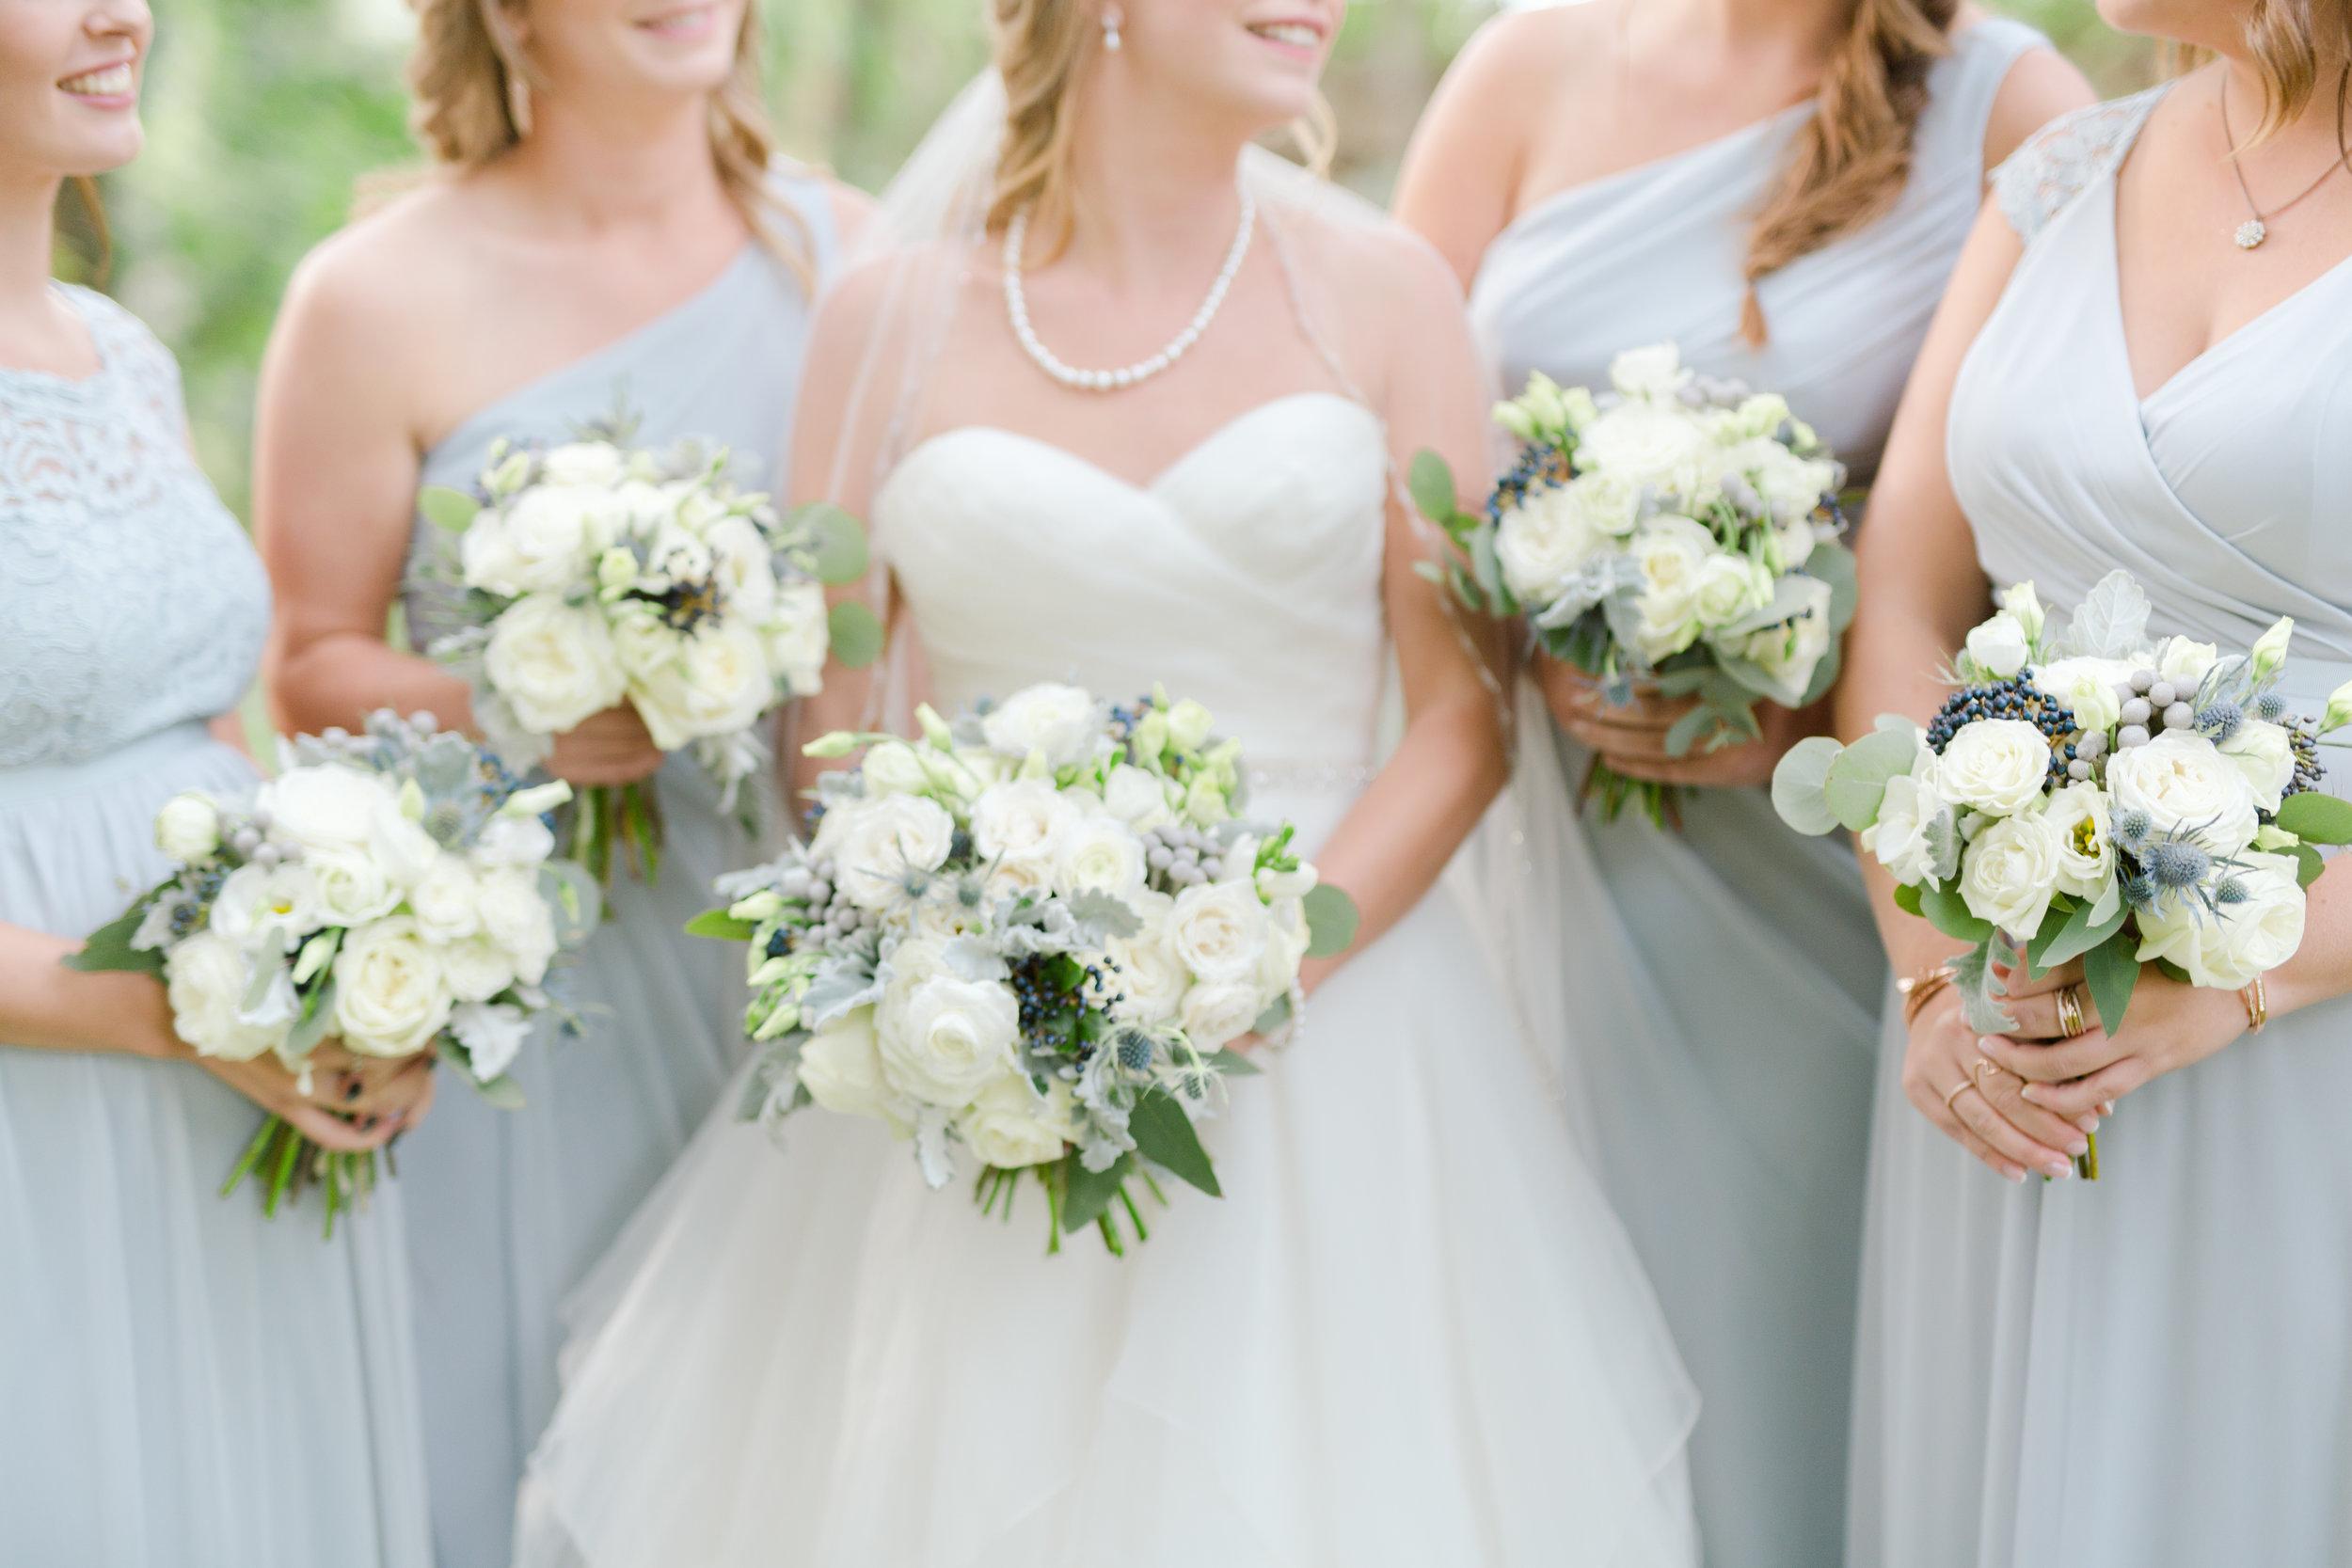 Melanie & Zach Wedding Photography September22 2018-867.jpg